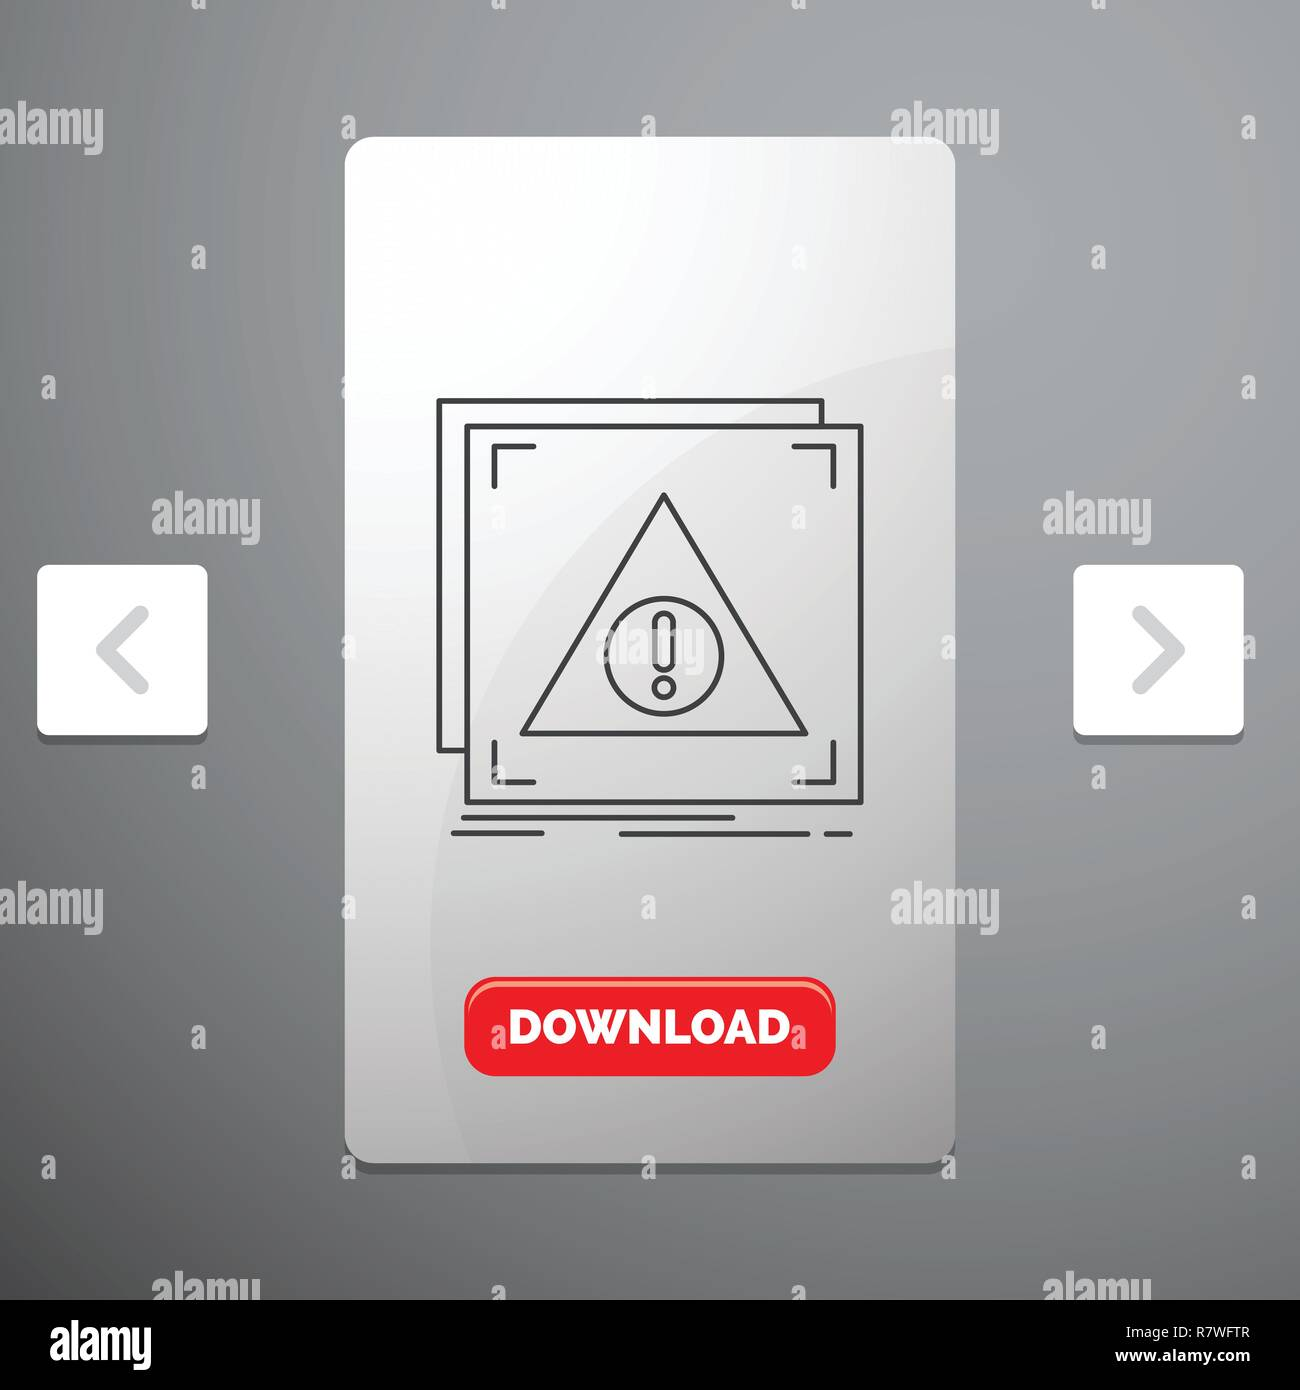 Error, Application, Denied, server, alert Line Icon in Carousal Pagination Slider Design & Red Download Button - Stock Image